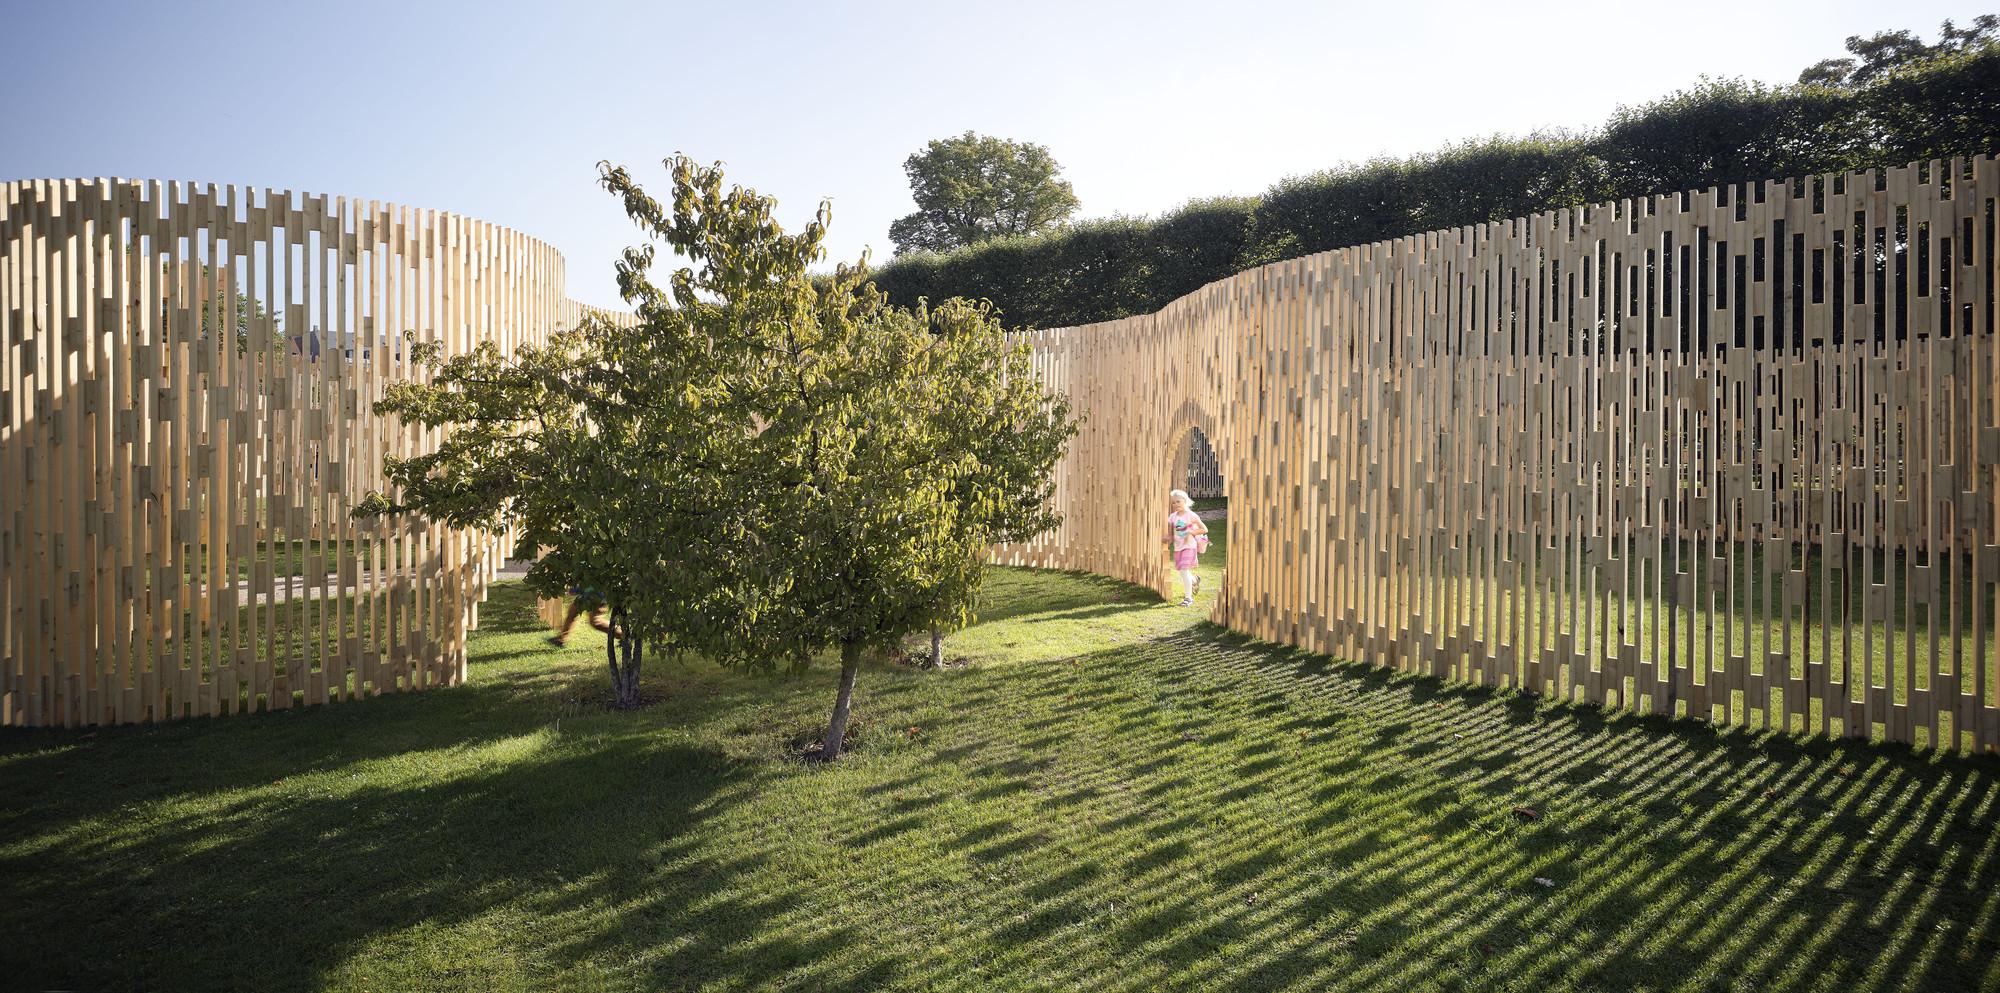 galeria de trylletromler fabric architecture 11. Black Bedroom Furniture Sets. Home Design Ideas